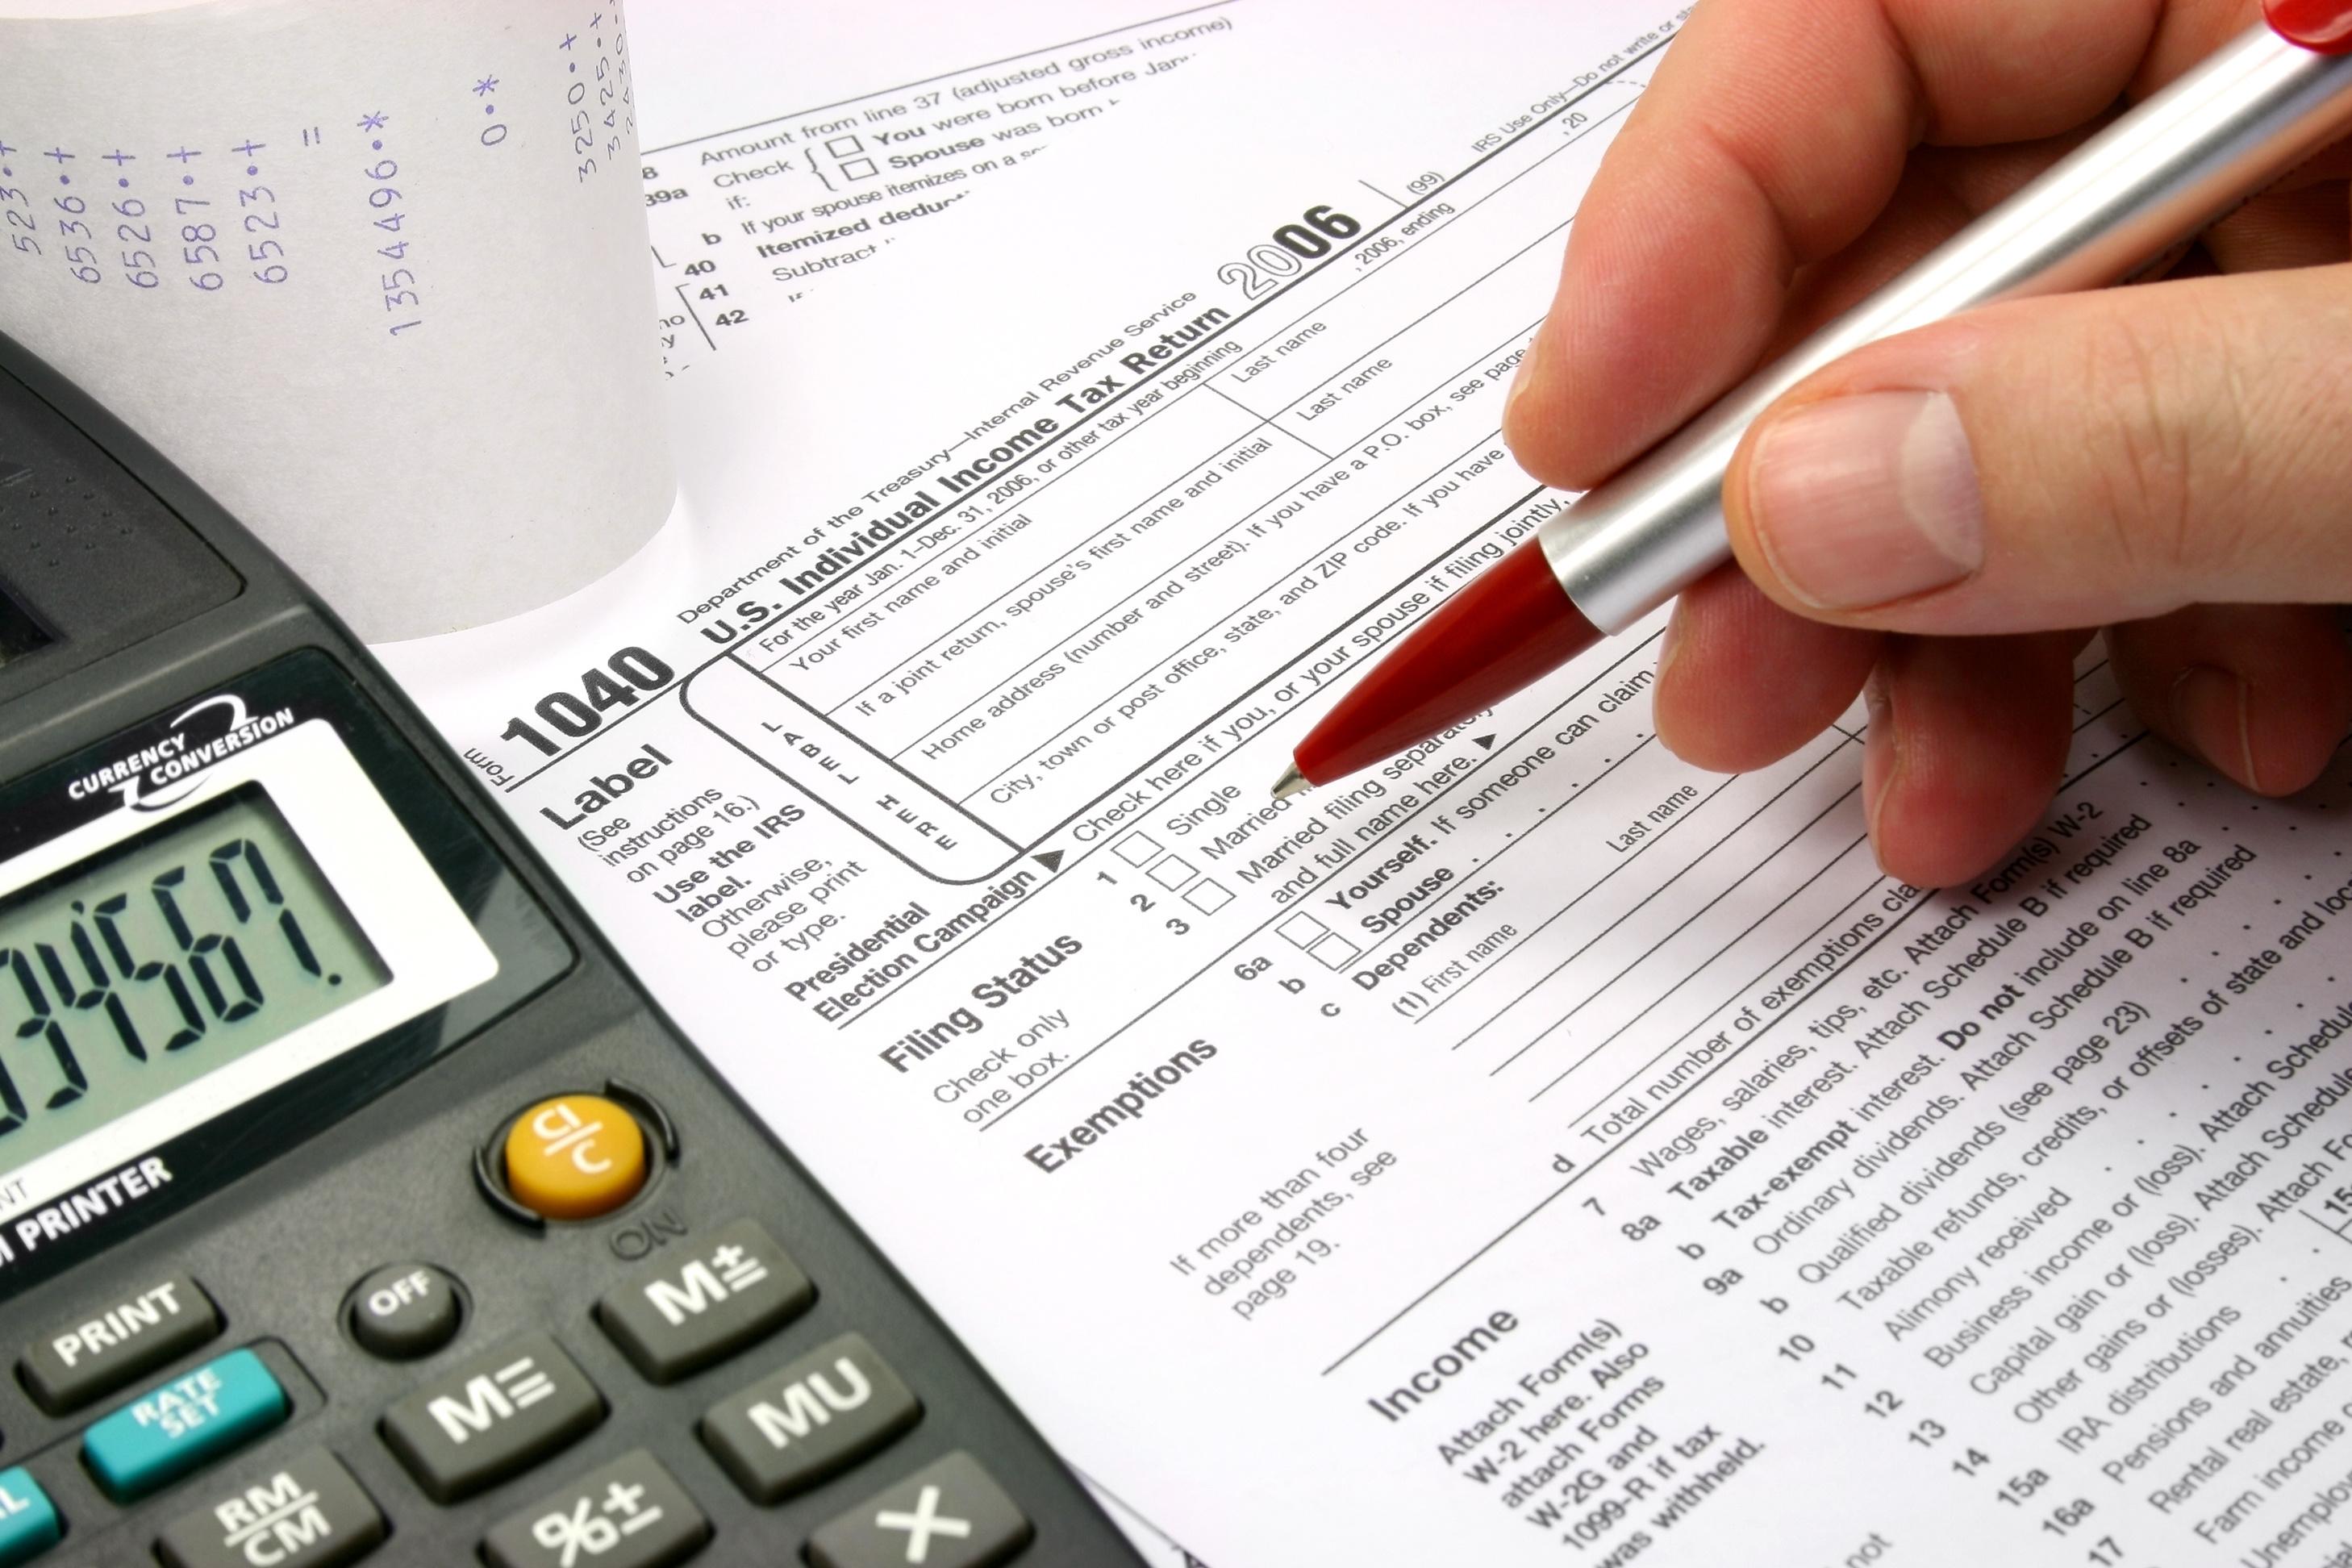 Idaho Falls woman goes to federal prison for preparing falsified tax forms  - East Idaho News